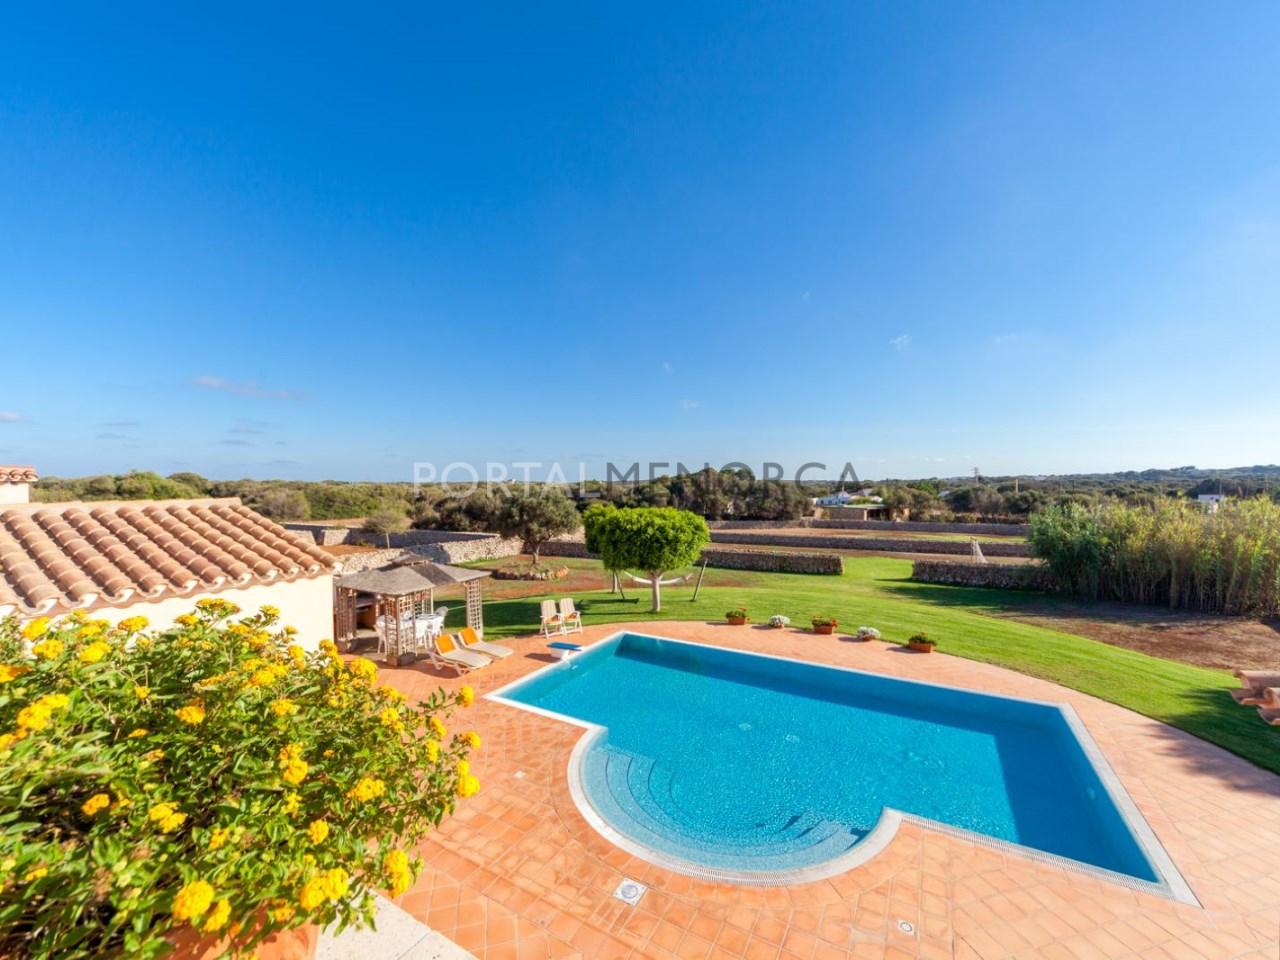 Casa de campo con piscina en Menorca (24 de 41)